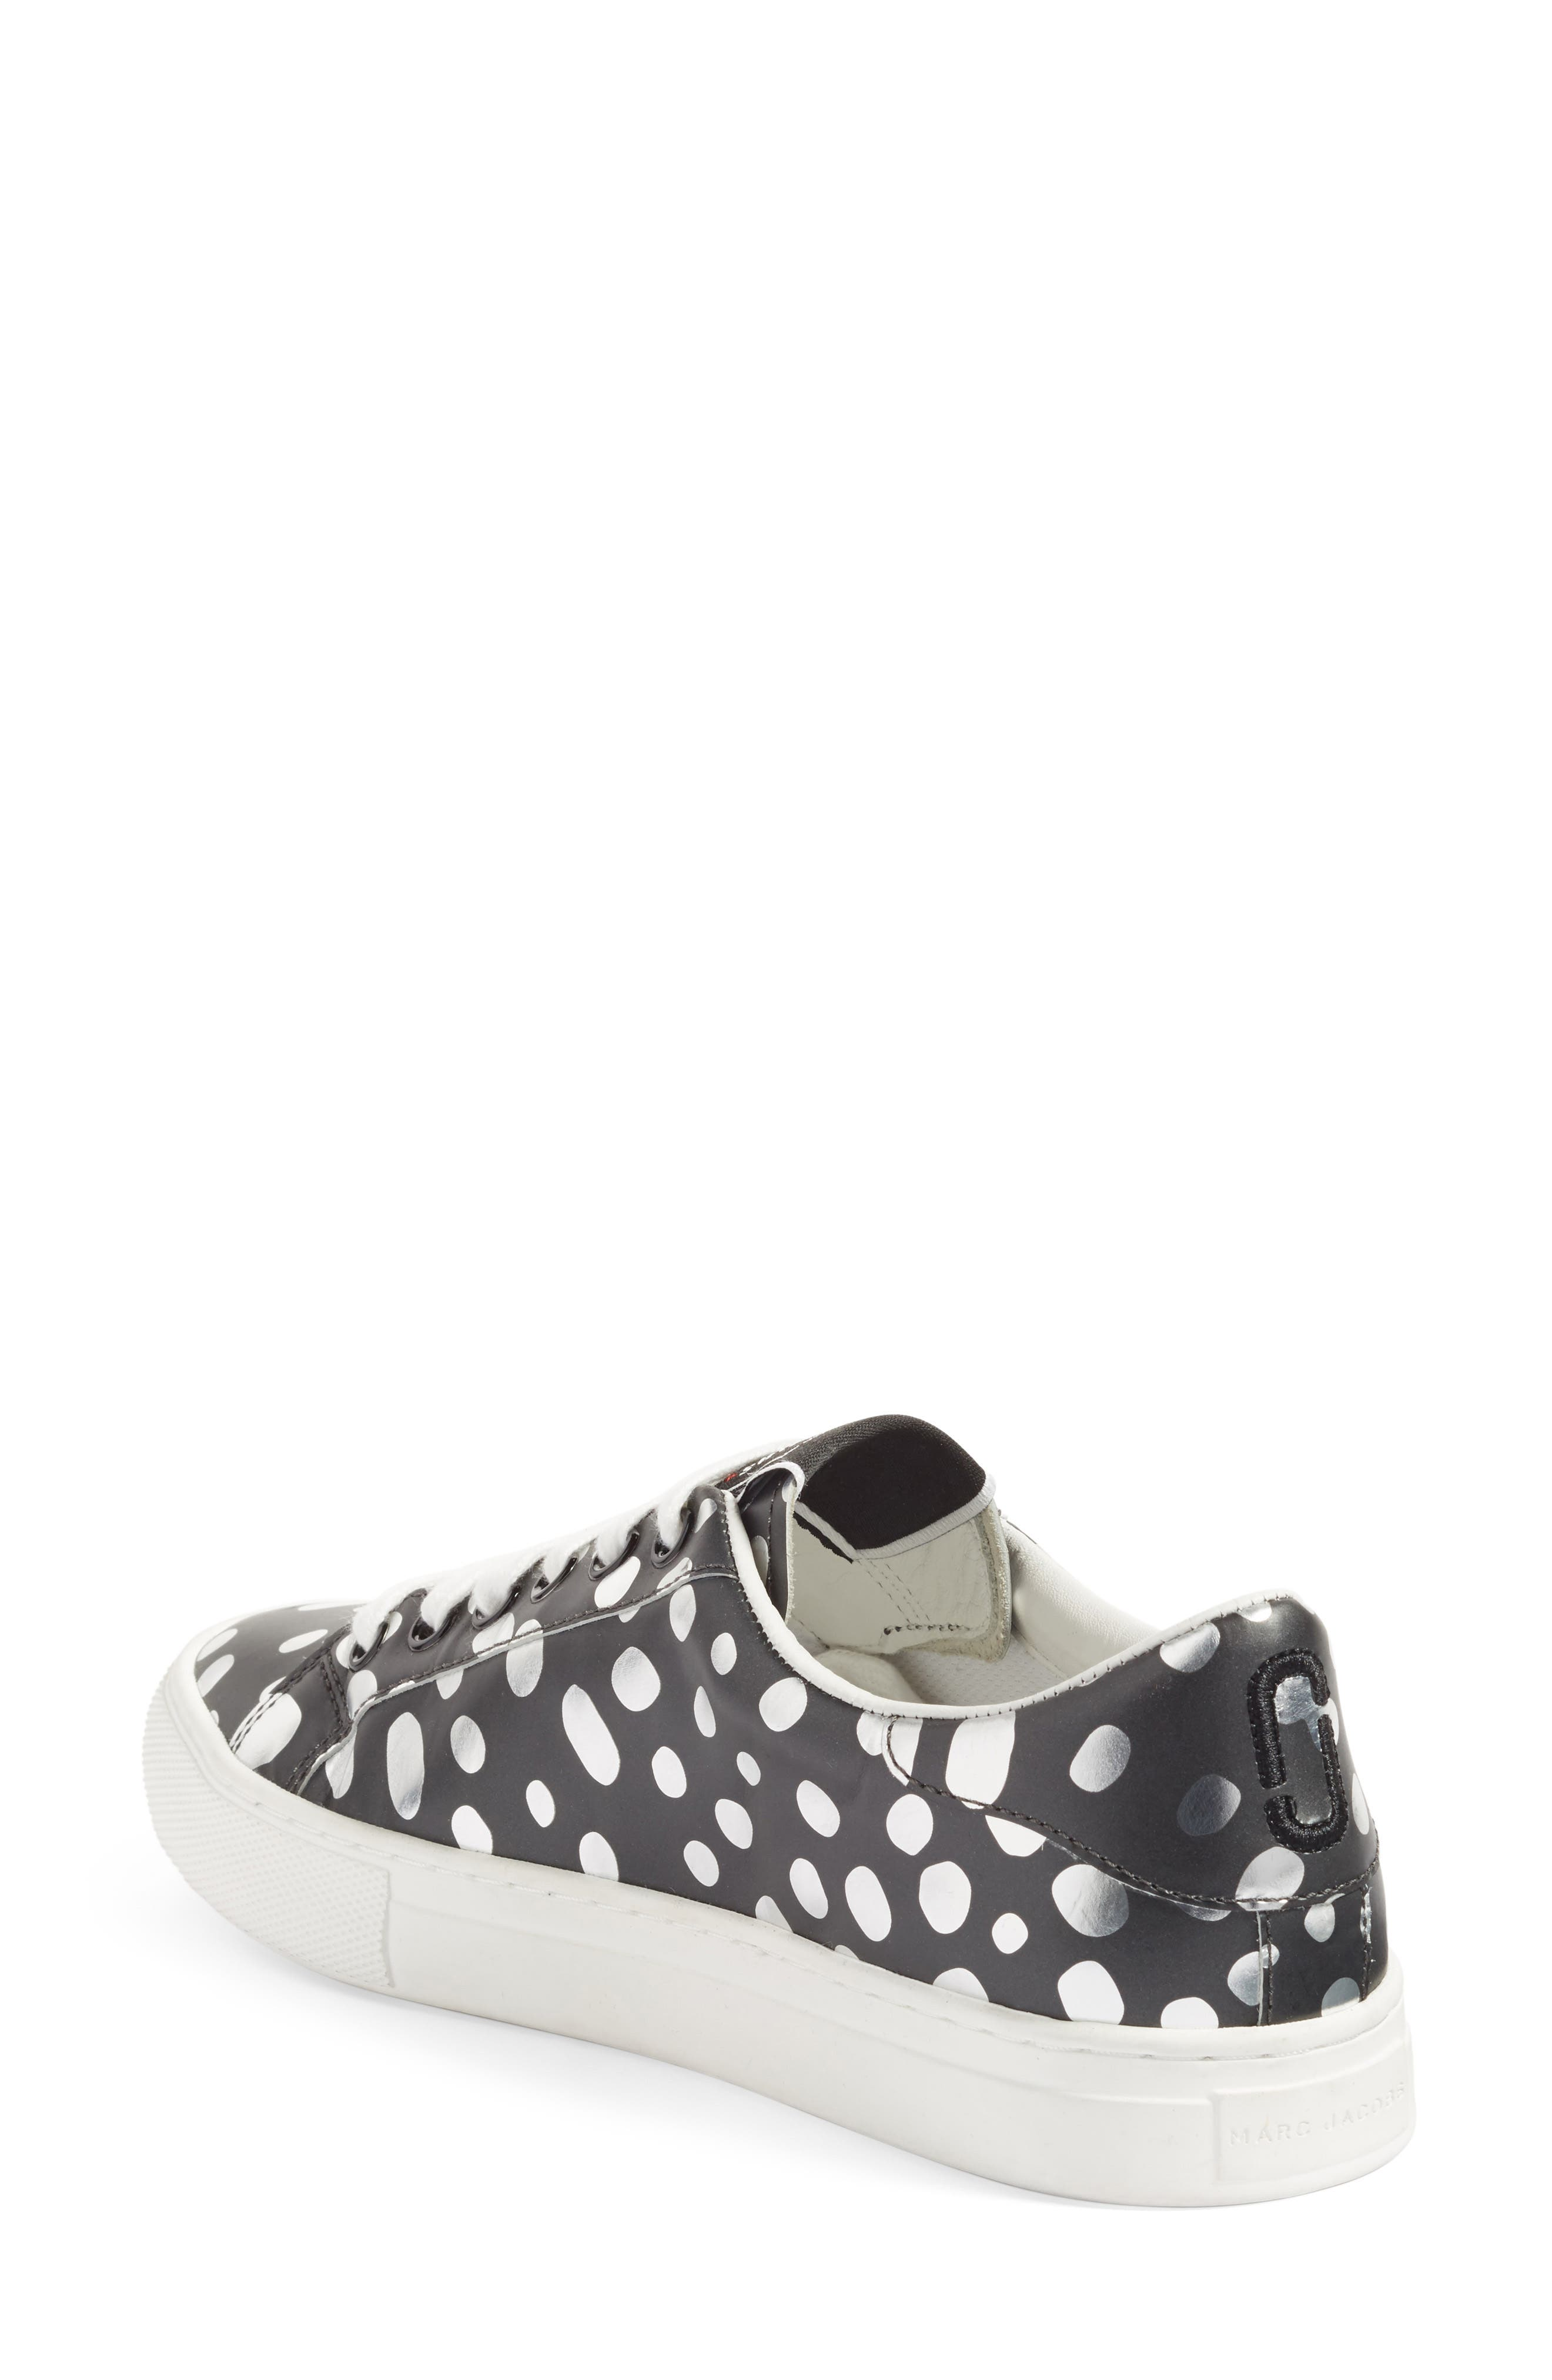 Empire Sneaker,                             Alternate thumbnail 2, color,                             099